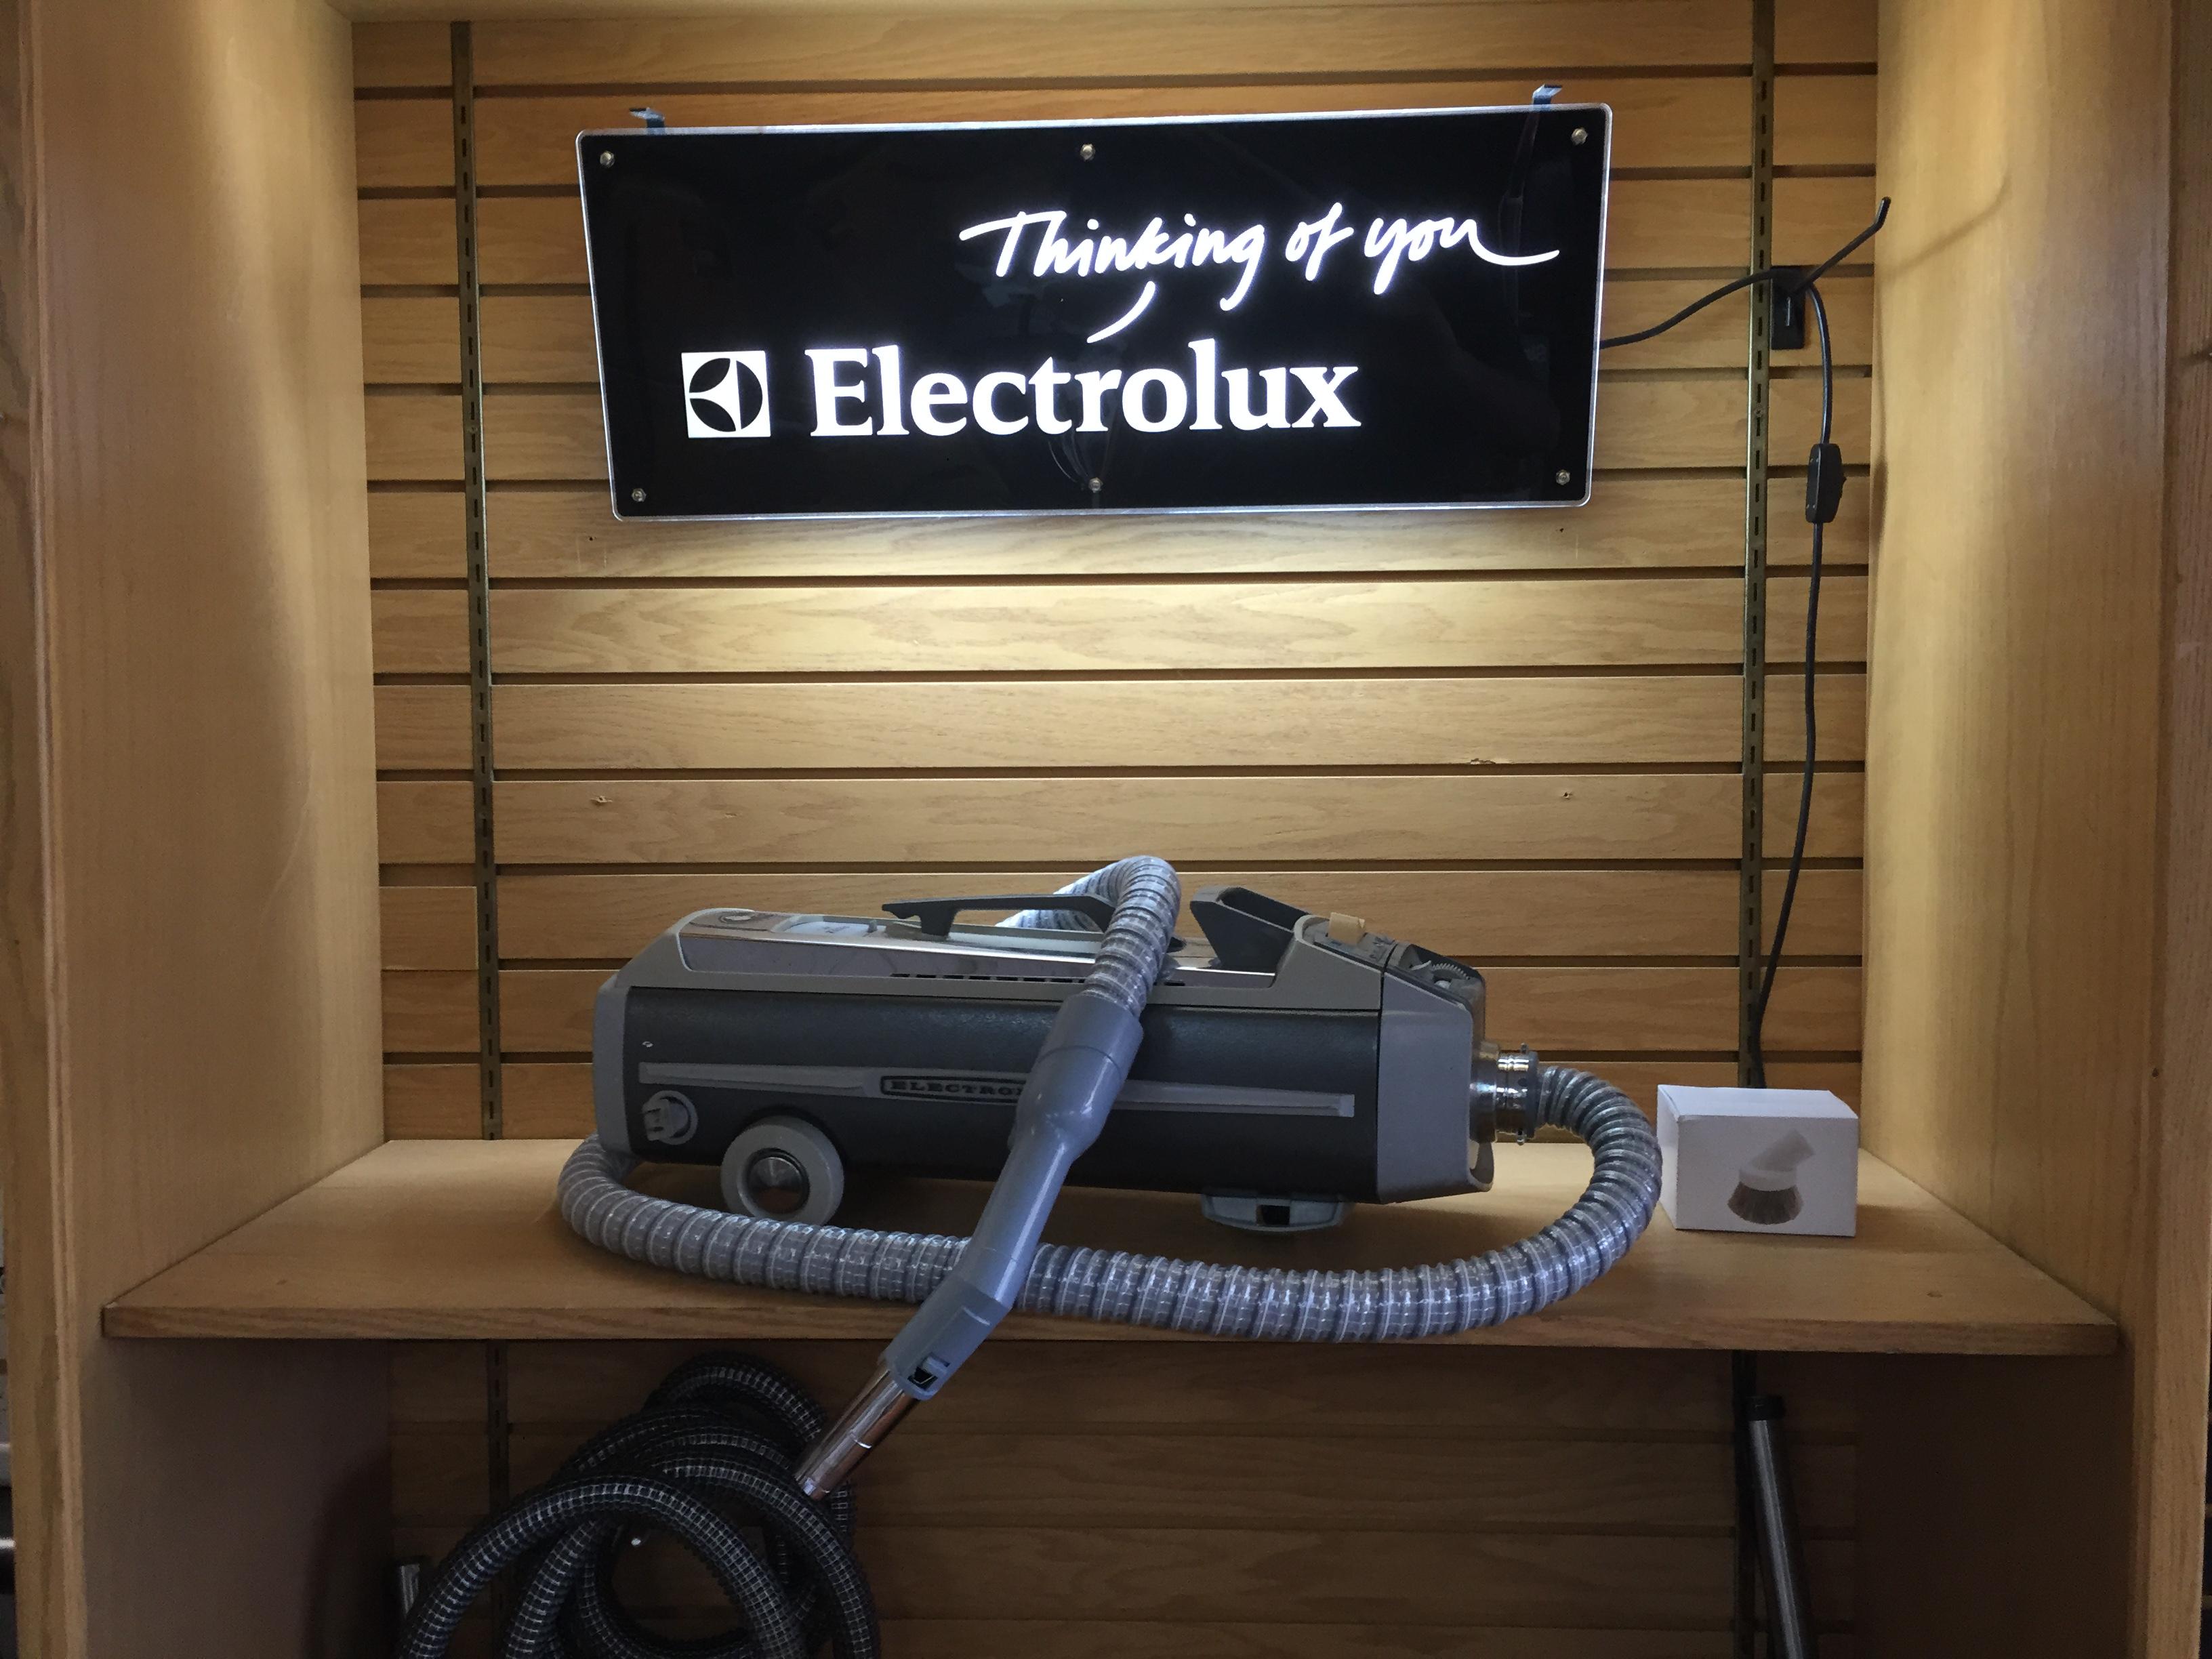 Electrolux_Silverado_Albany_glens_falls_ny.jpg